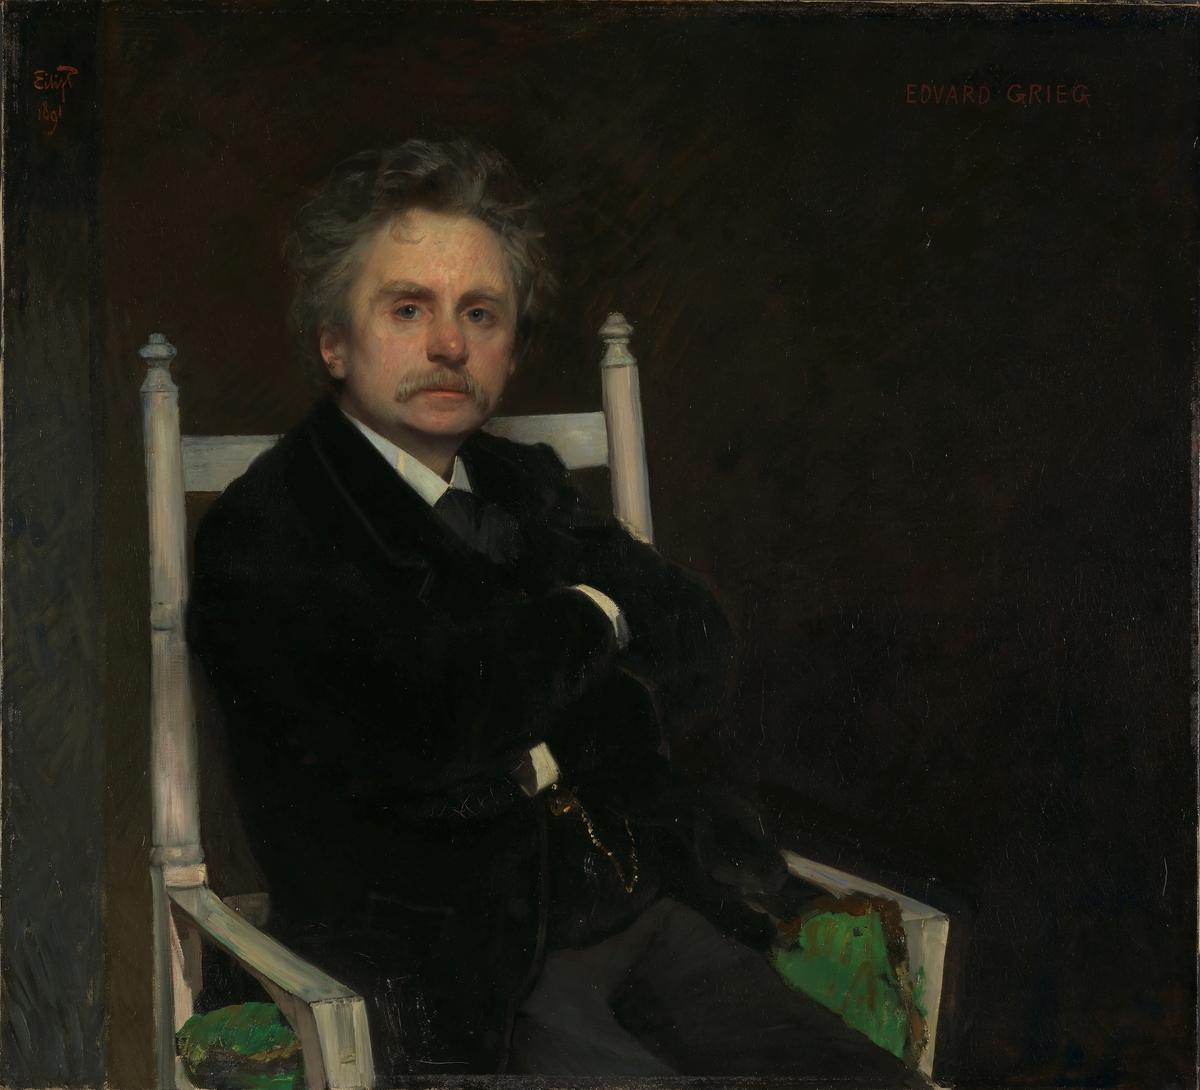 Komponisten Edvard Grieg [Maleri]